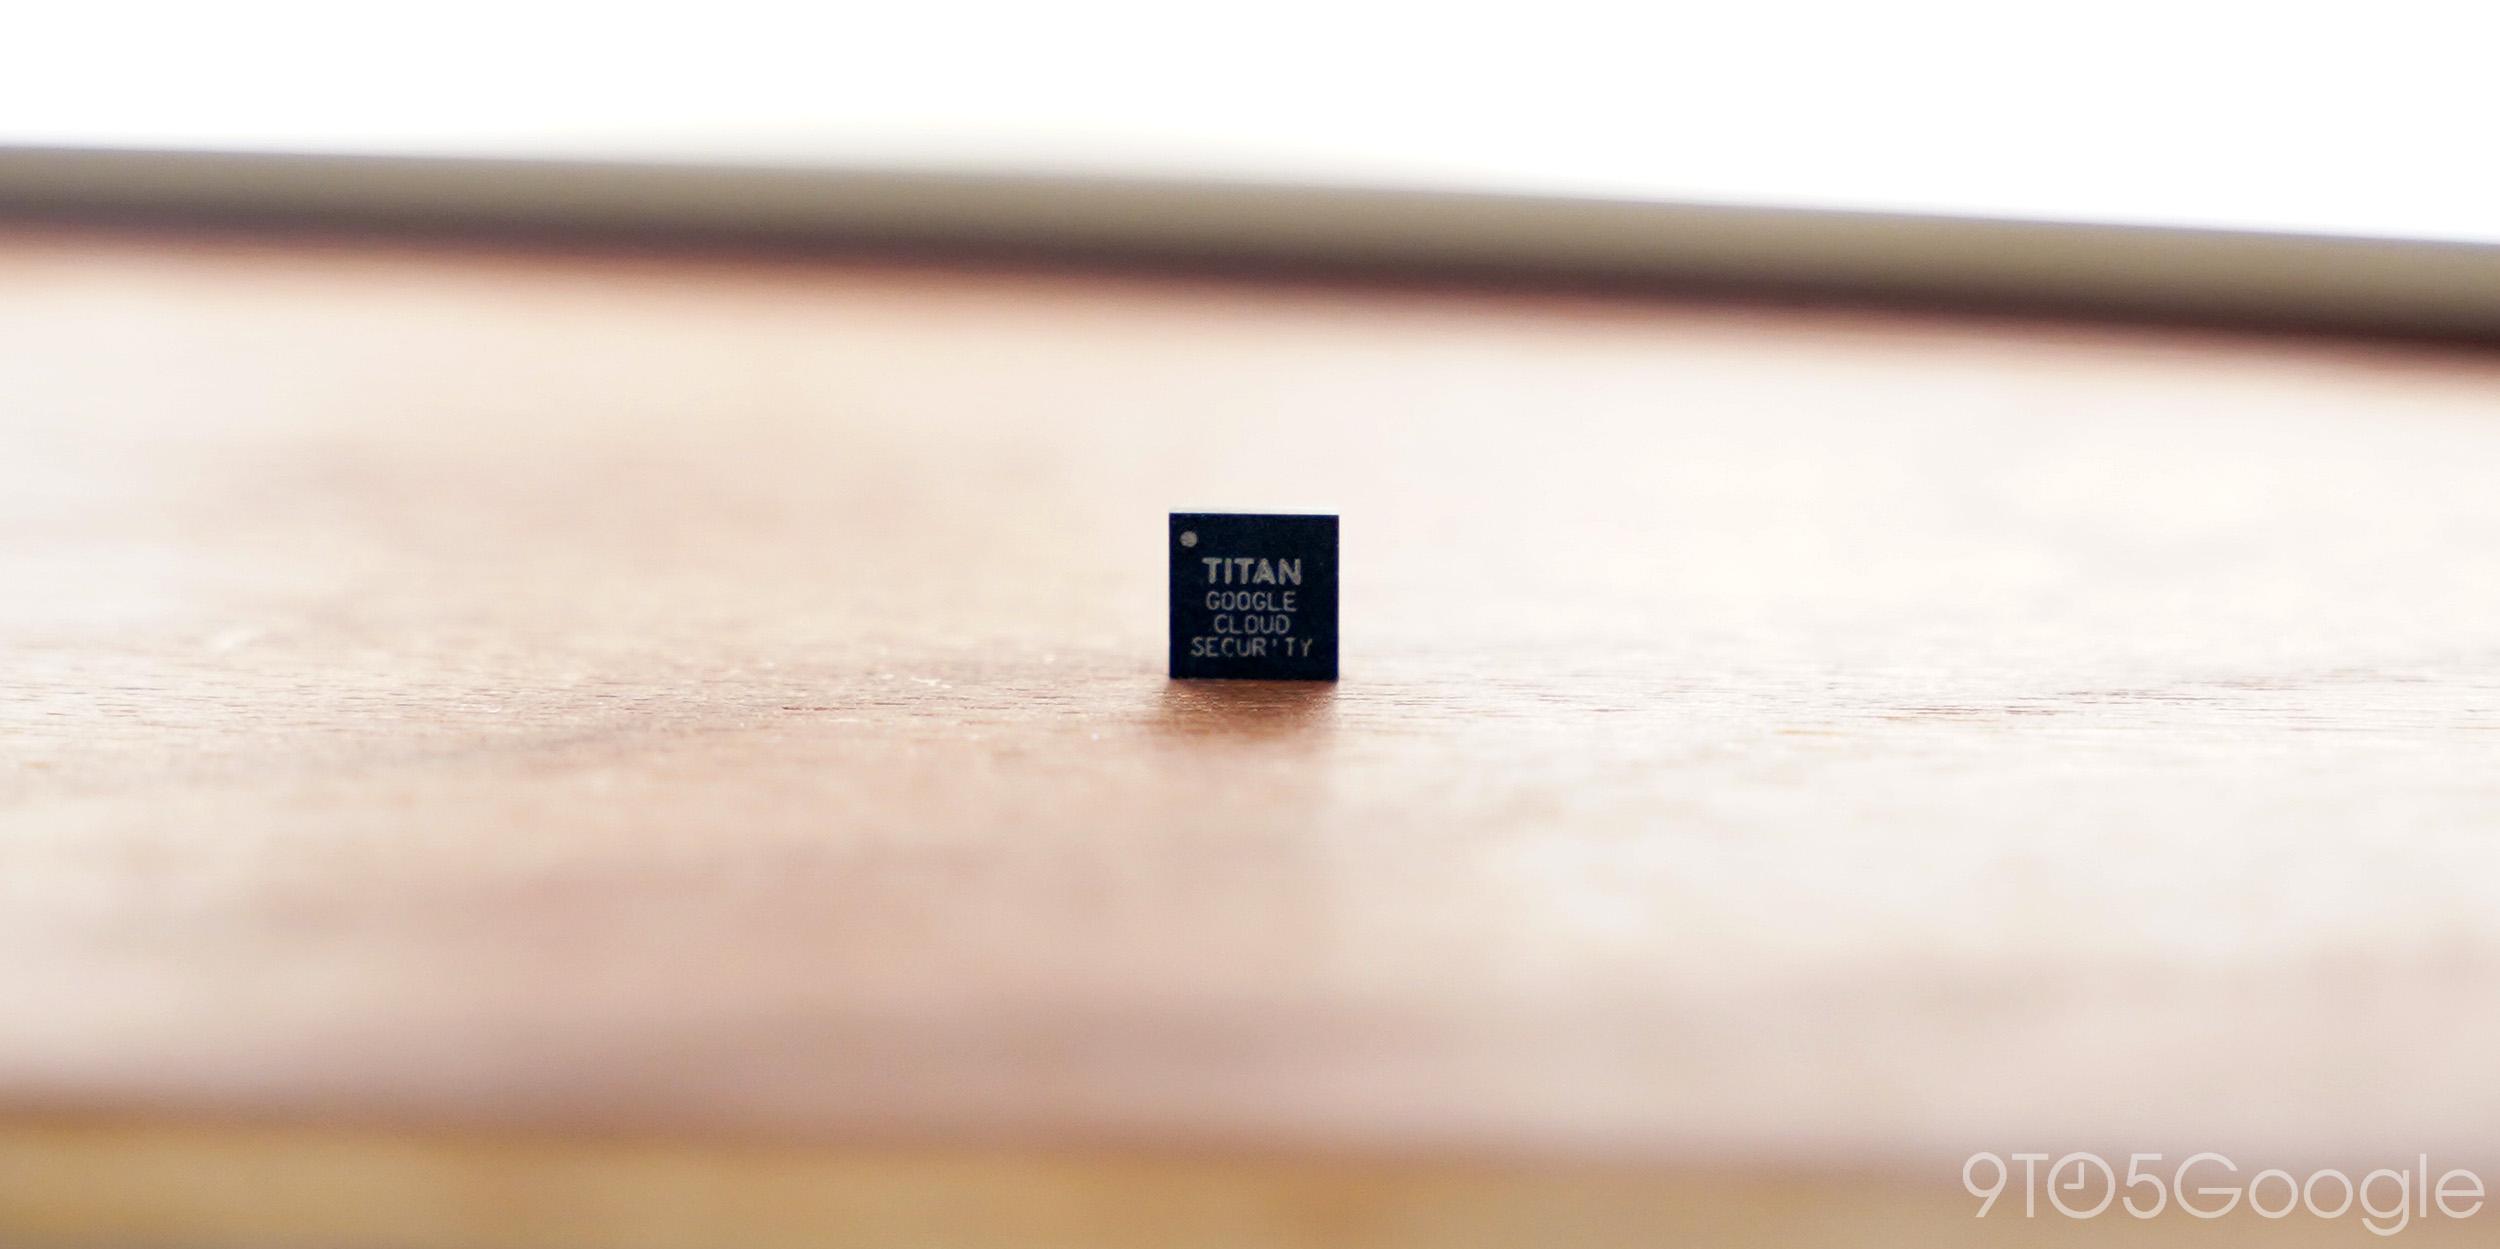 Titan chip